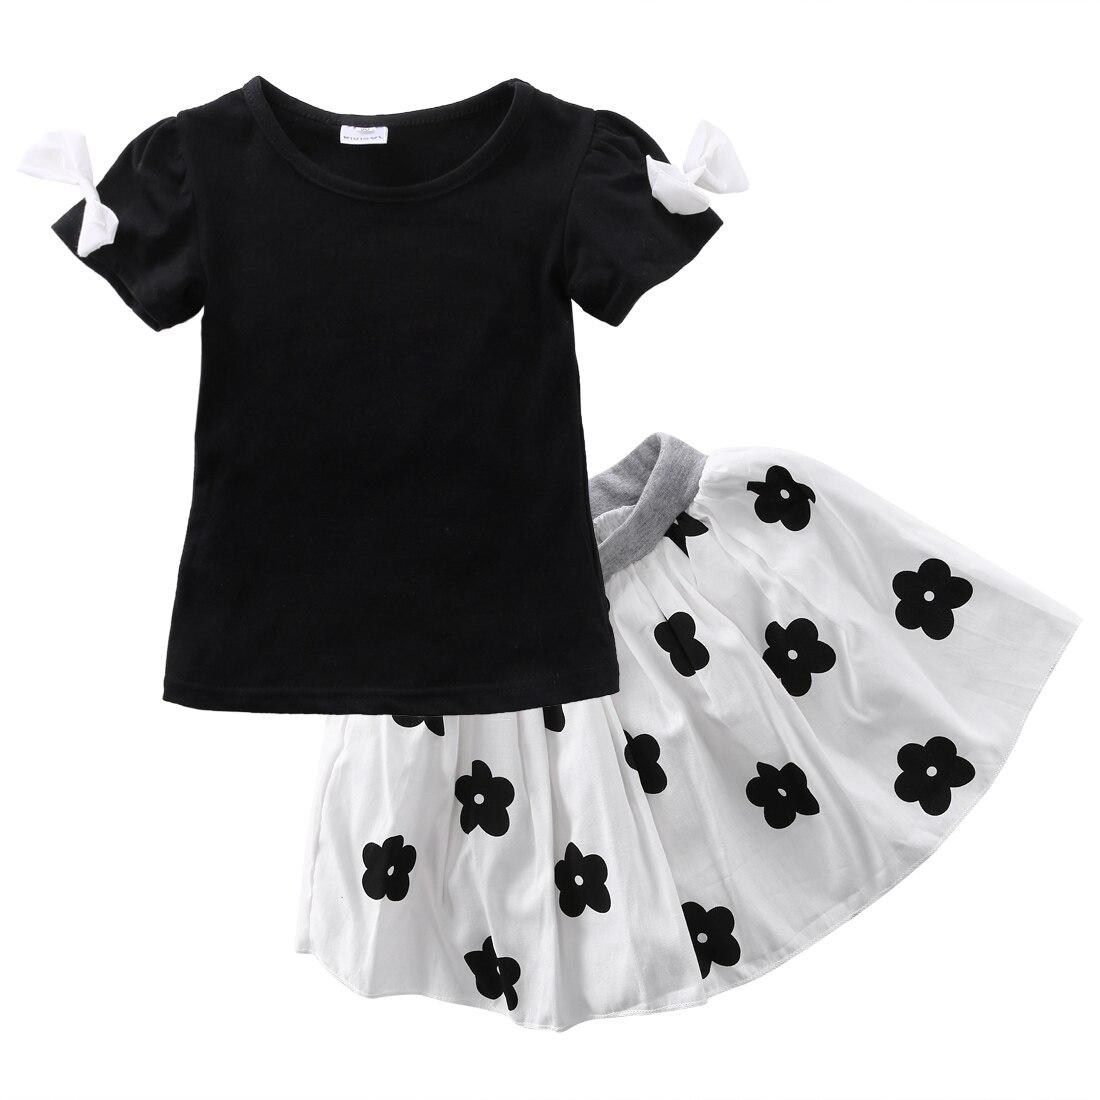 2pcs Kids Baby Girls Clothes sets Short sleeve T-shirt Tops+Tutu Skirts Suits Kids girls cute cotton summer Outfits HOT Sales